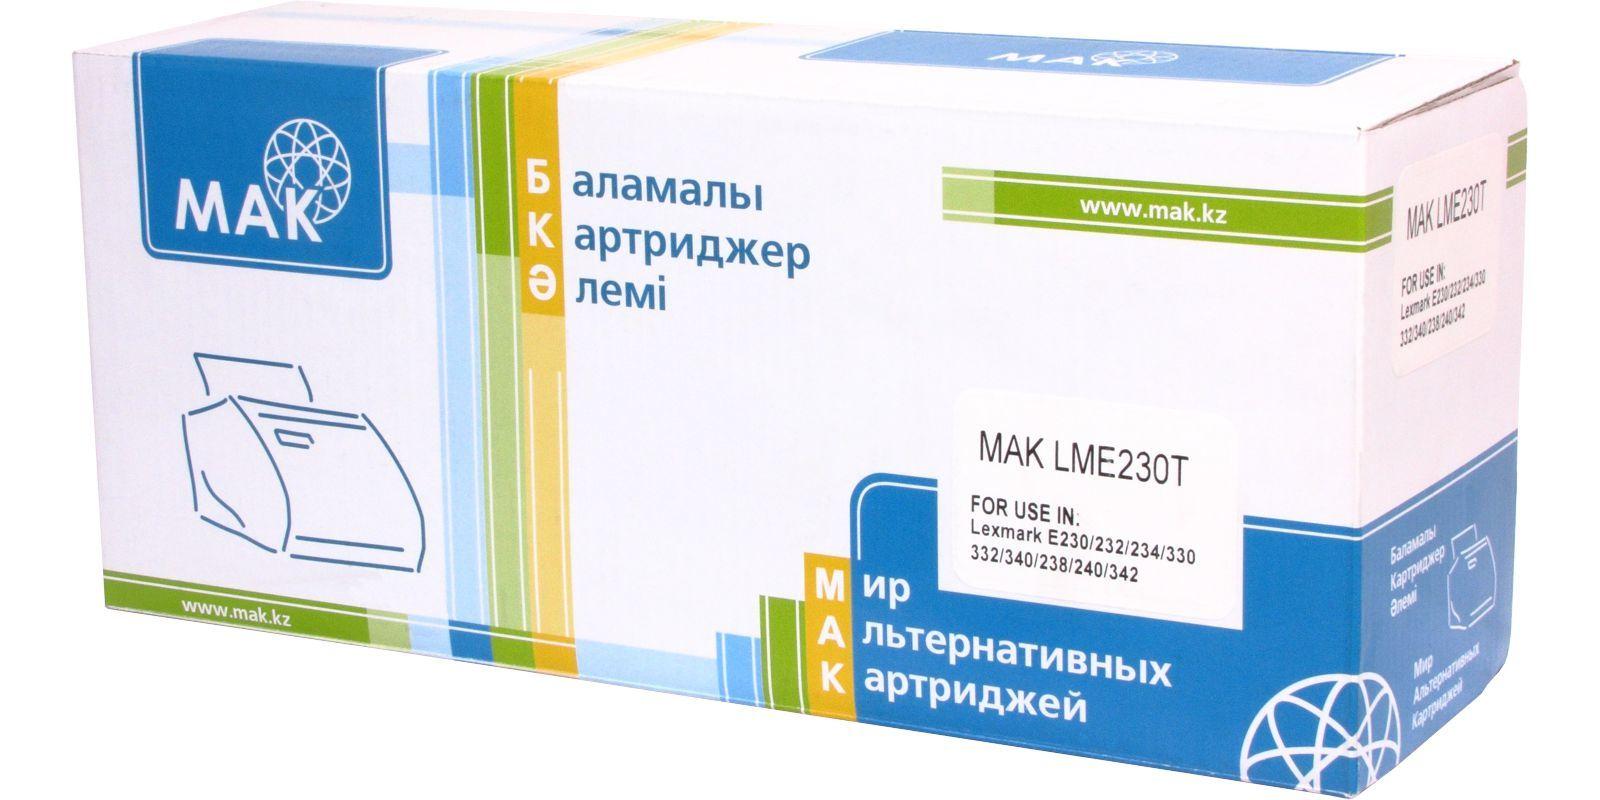 MAK 24036SE (E230) черный, для Lexmark, до 2500 стр.